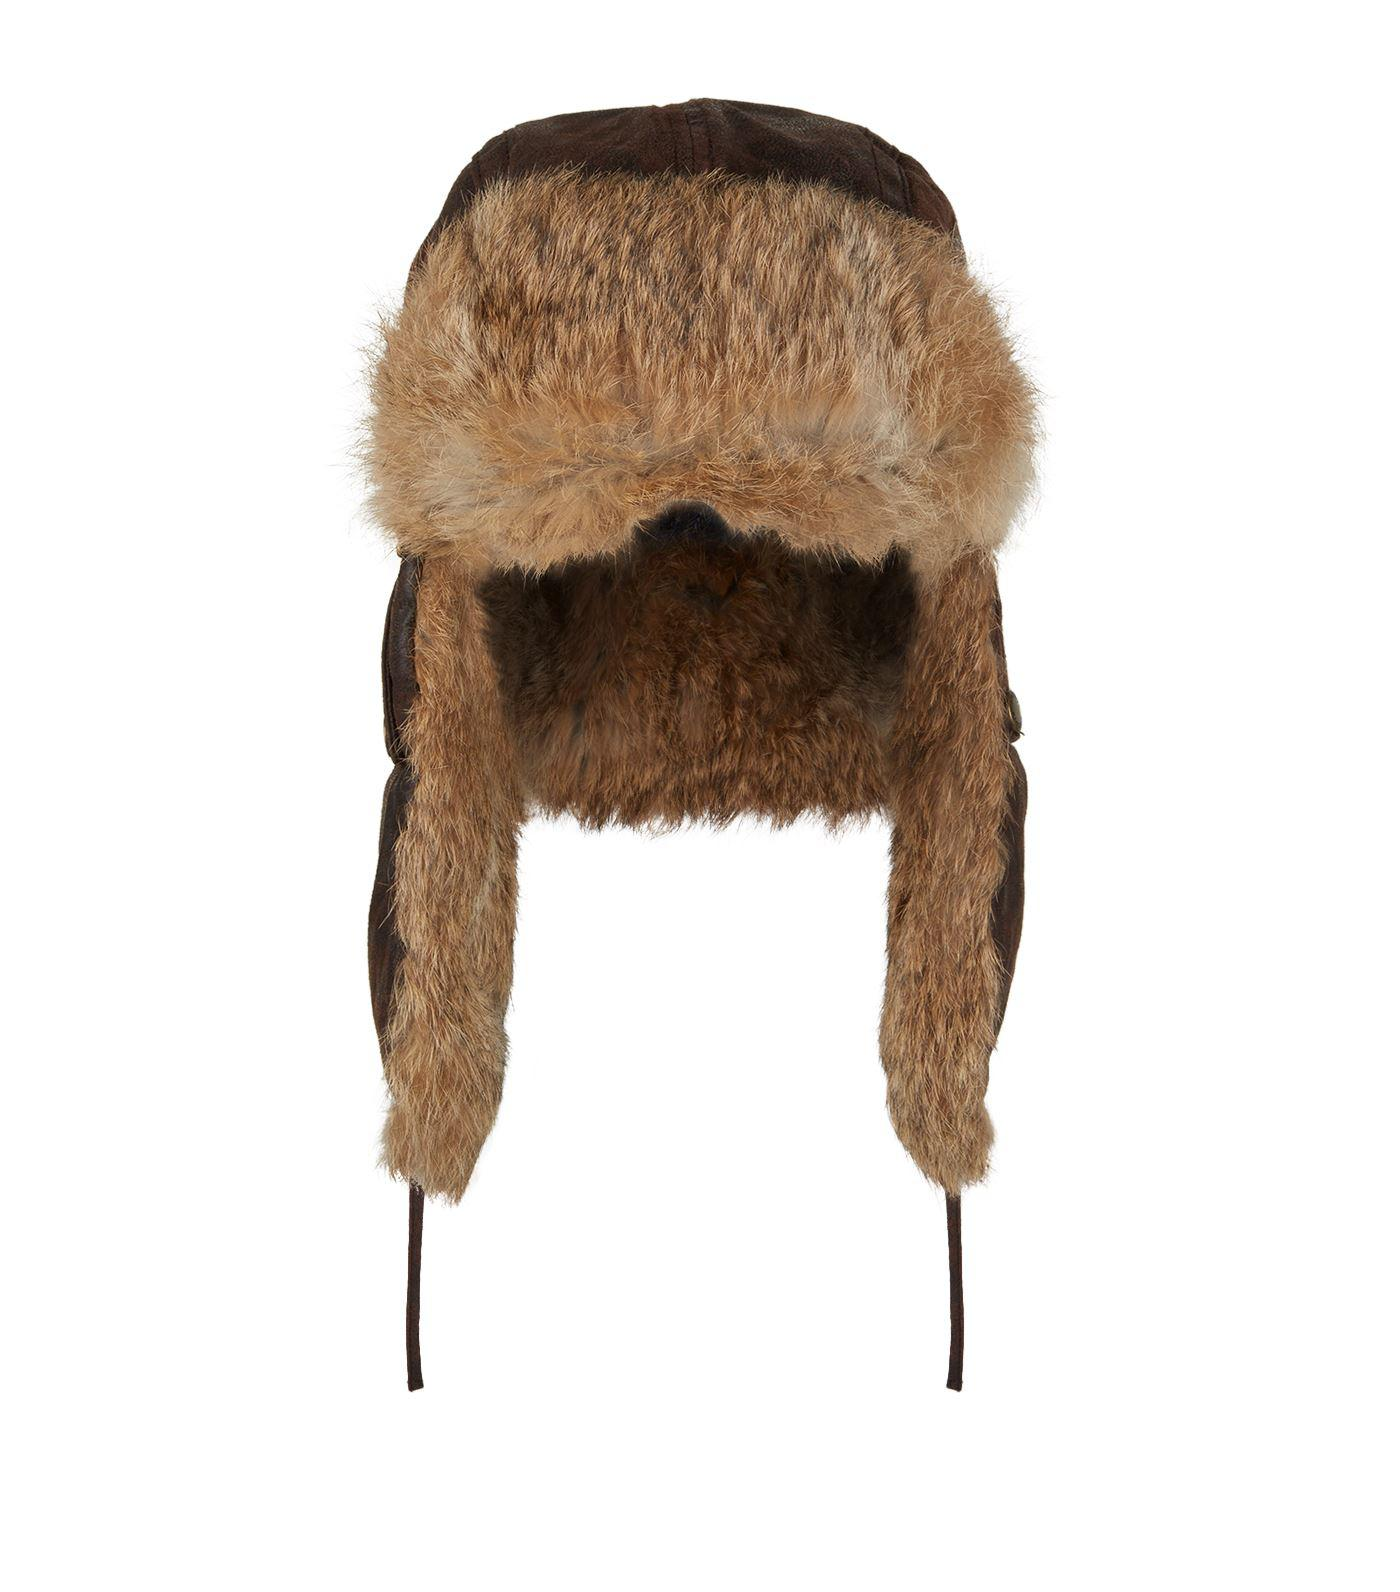 Lyst - Stetson Starkville Aviator Hat in Brown for Men 71c72856ee3d